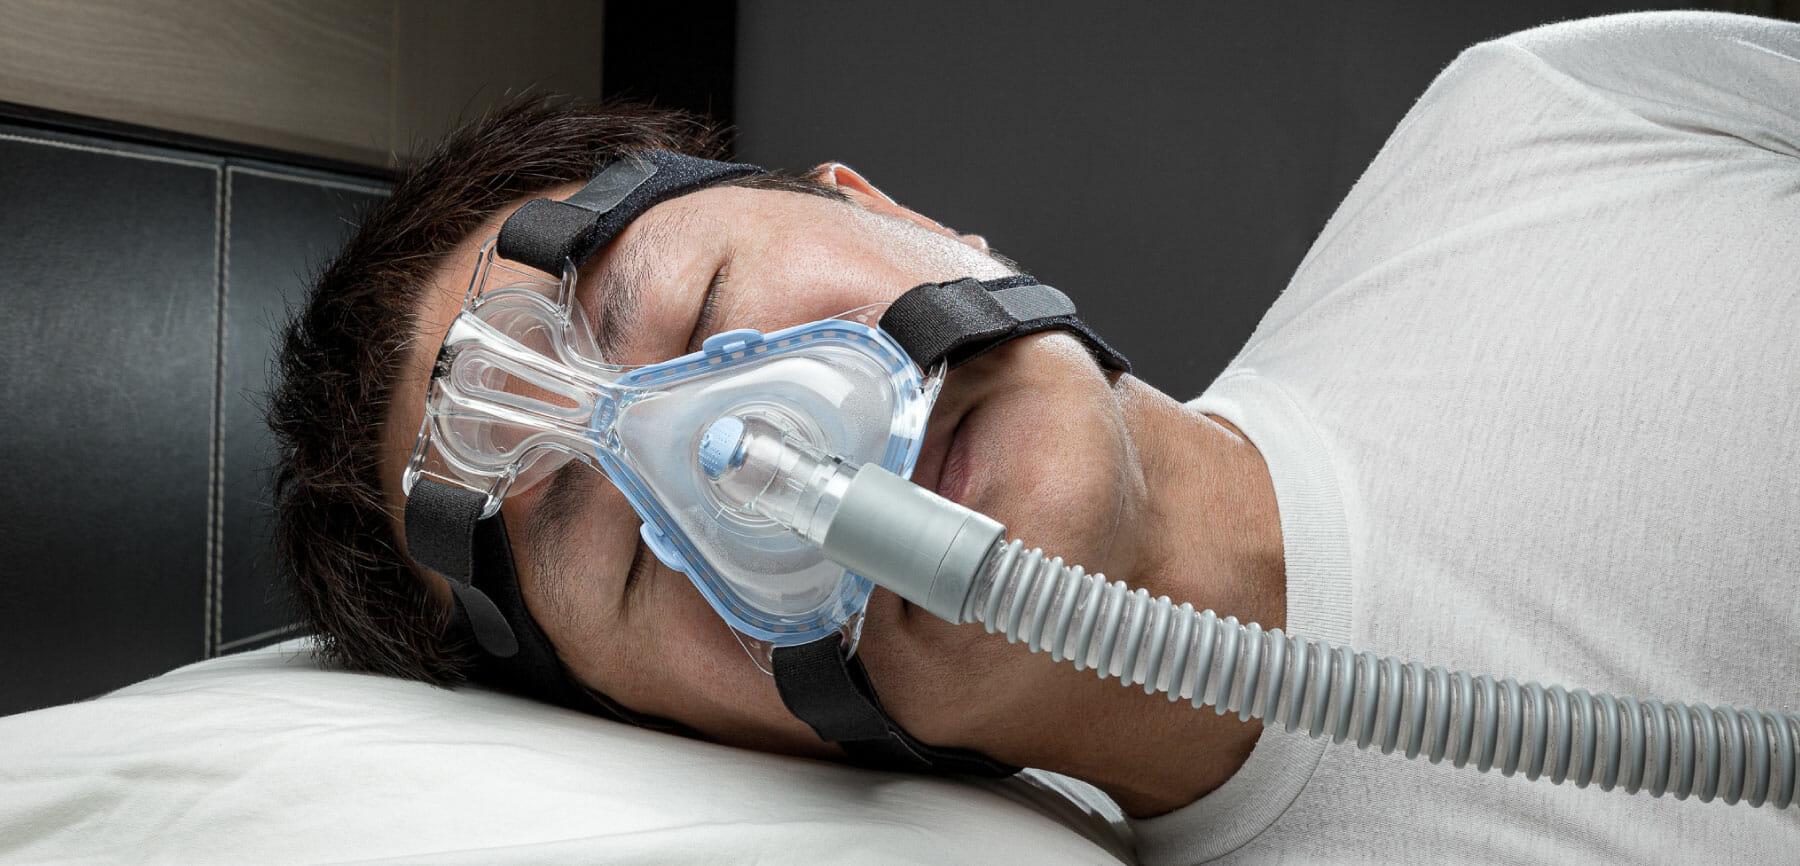 Where To Buy Sleep Apnea Machine